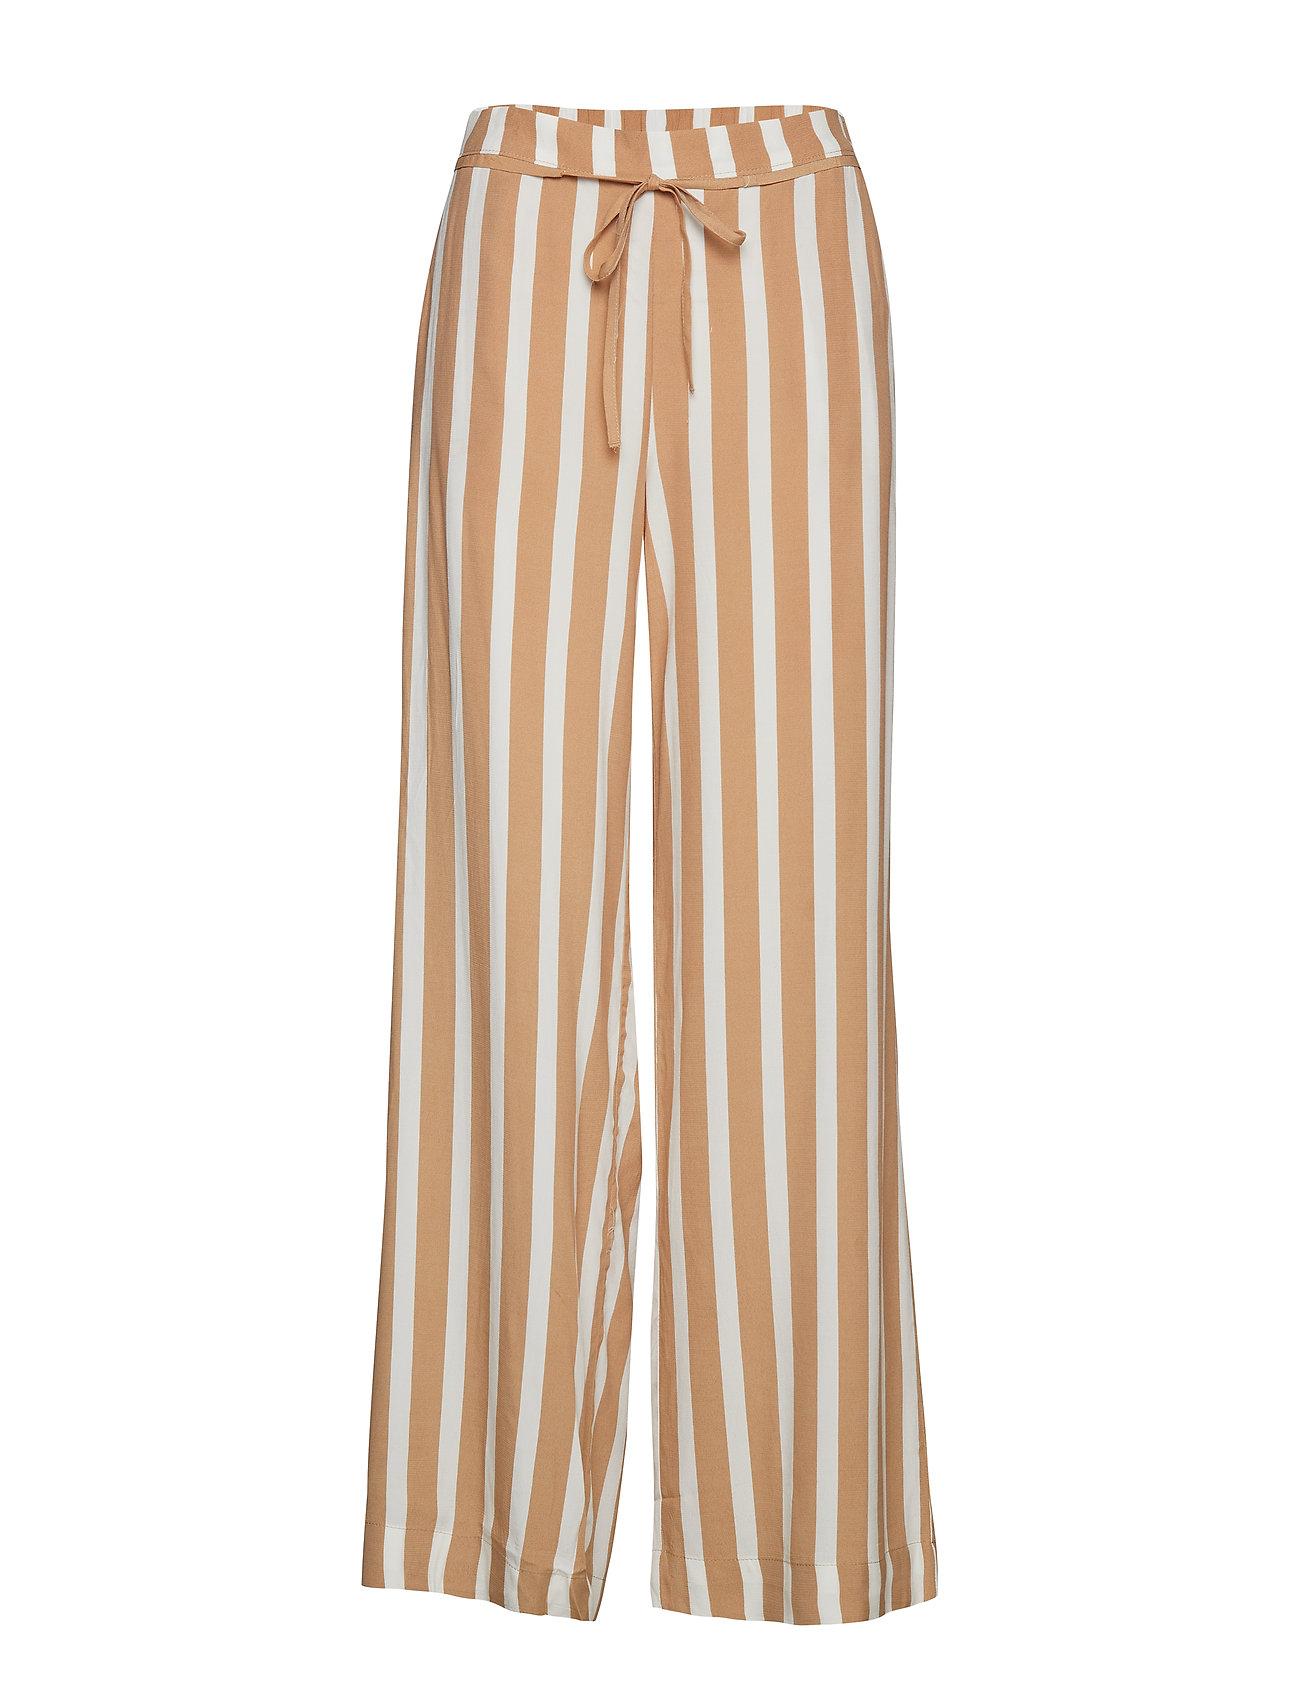 Mango Flowy printed trousers - LIGHT BEIGE